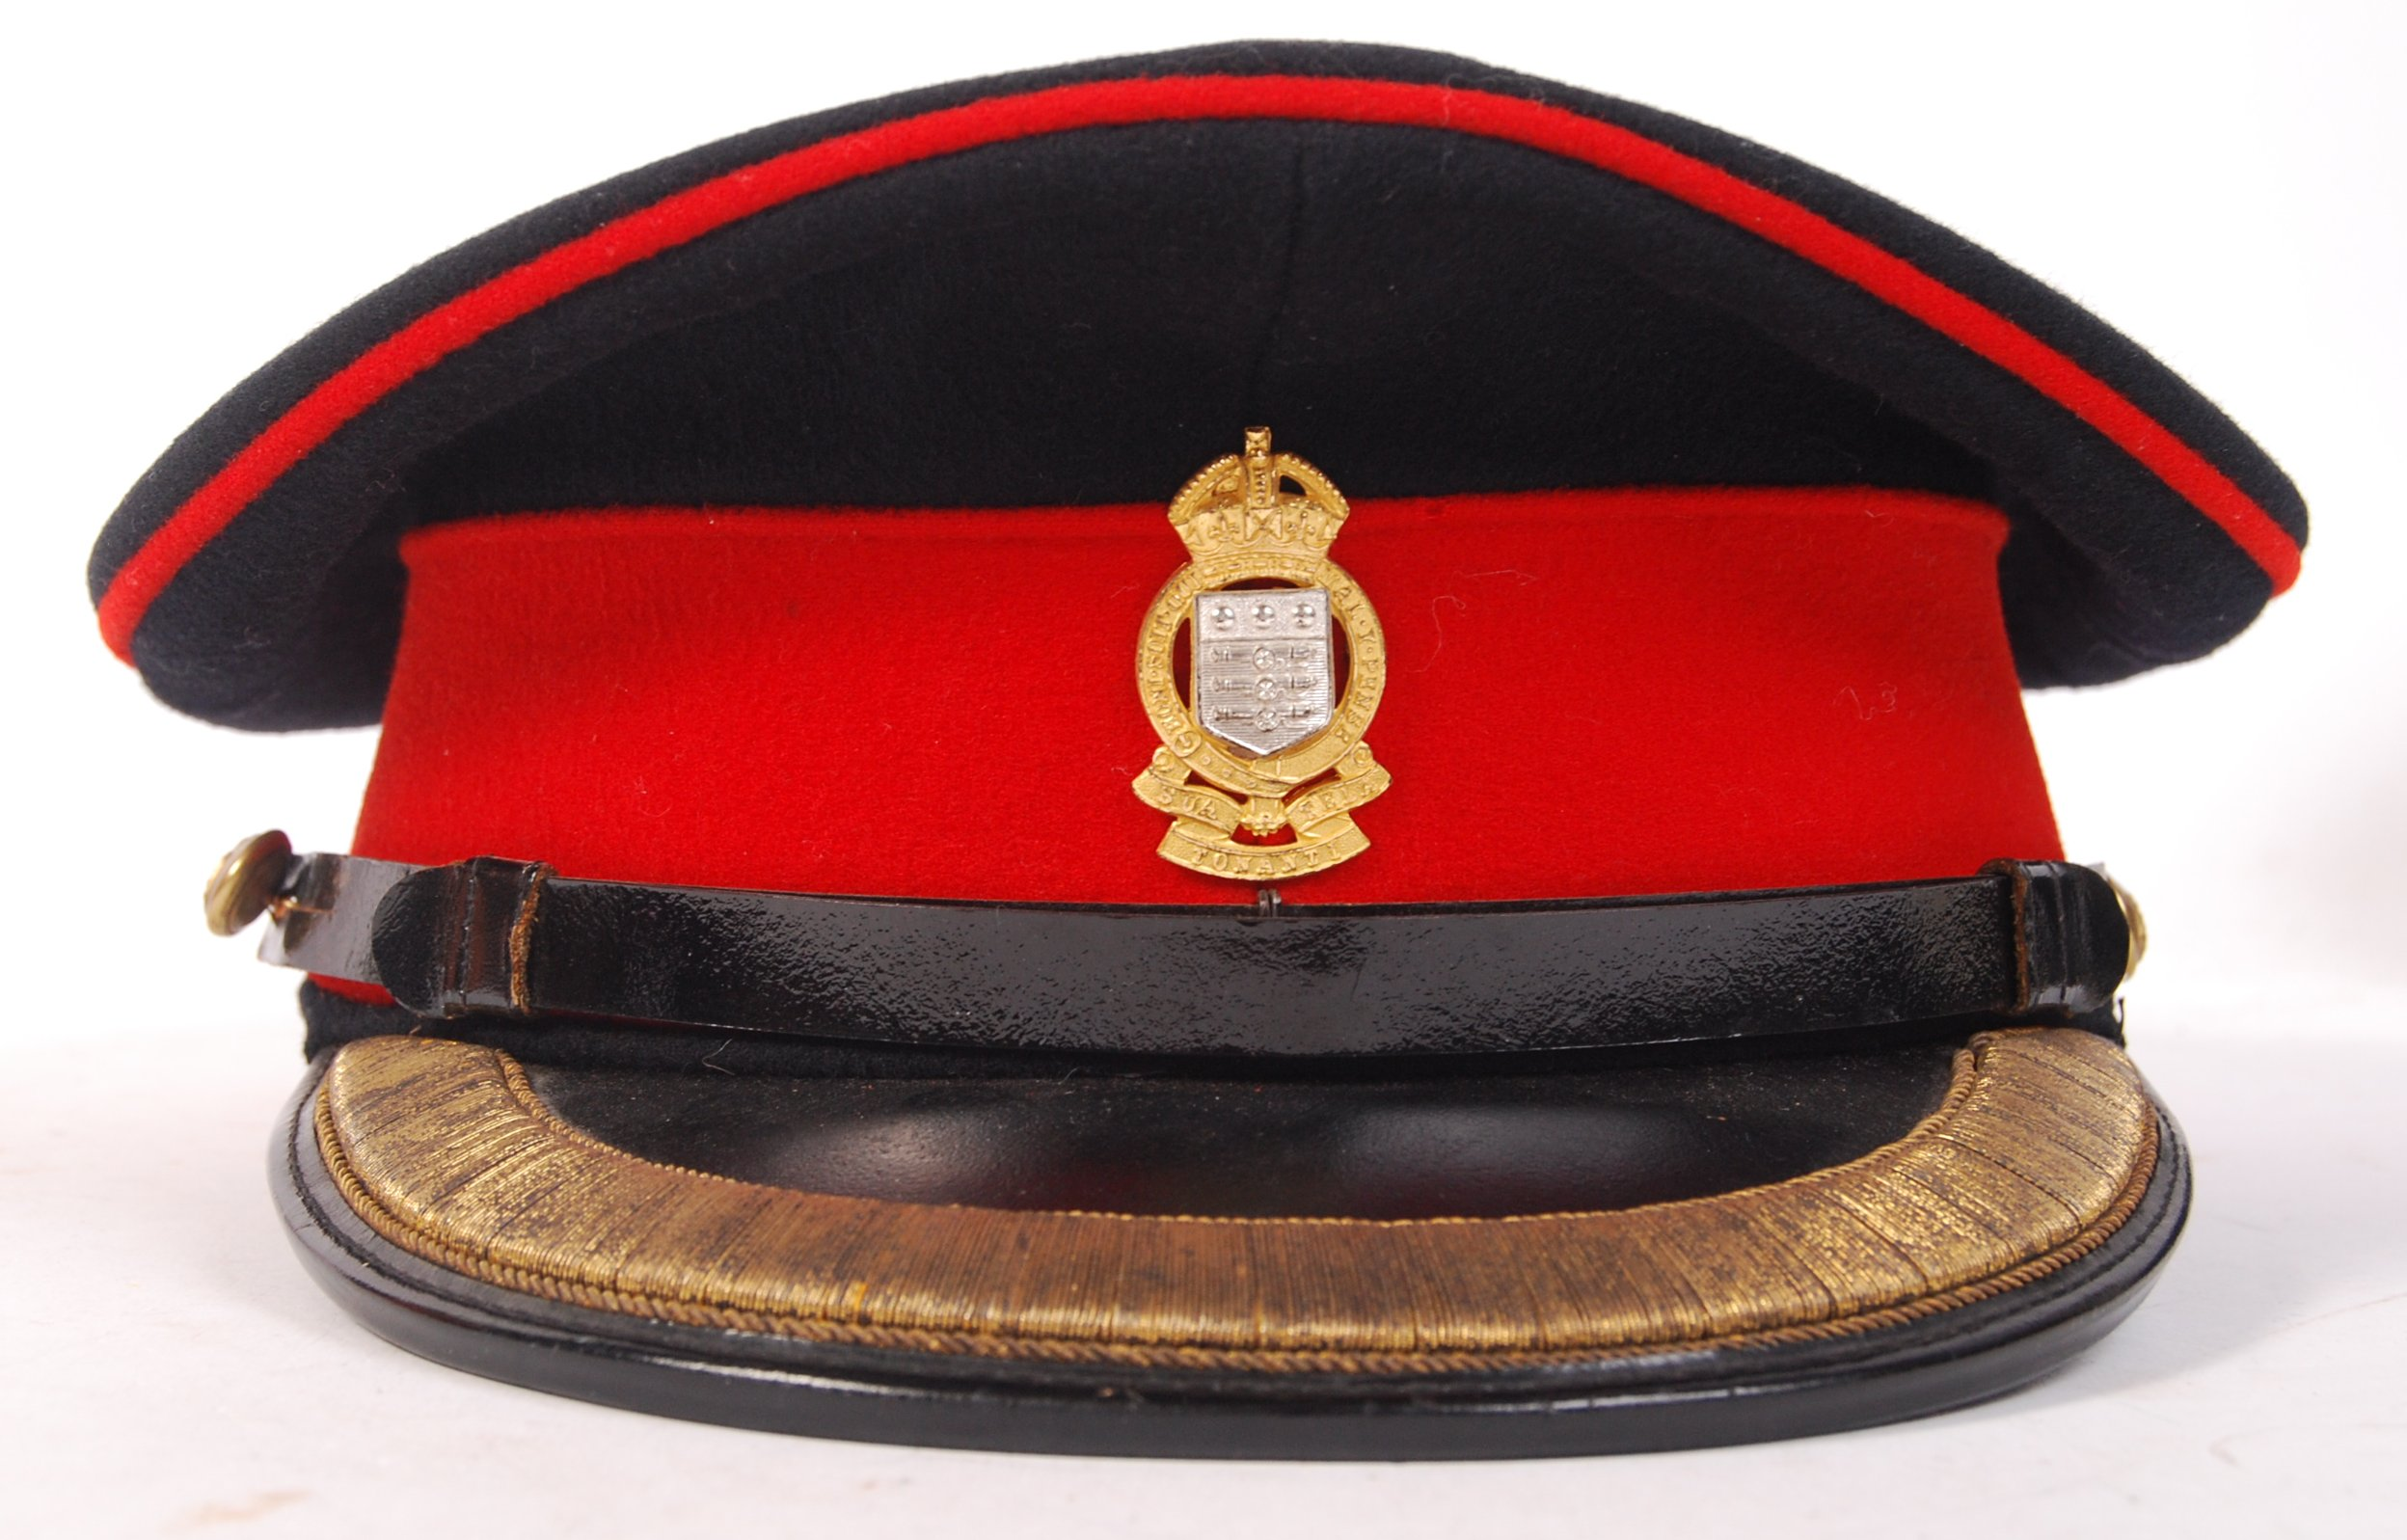 POST-WWII SECOND WORLD WAR RAOC OFFICER'S DRESS CA - Image 2 of 4